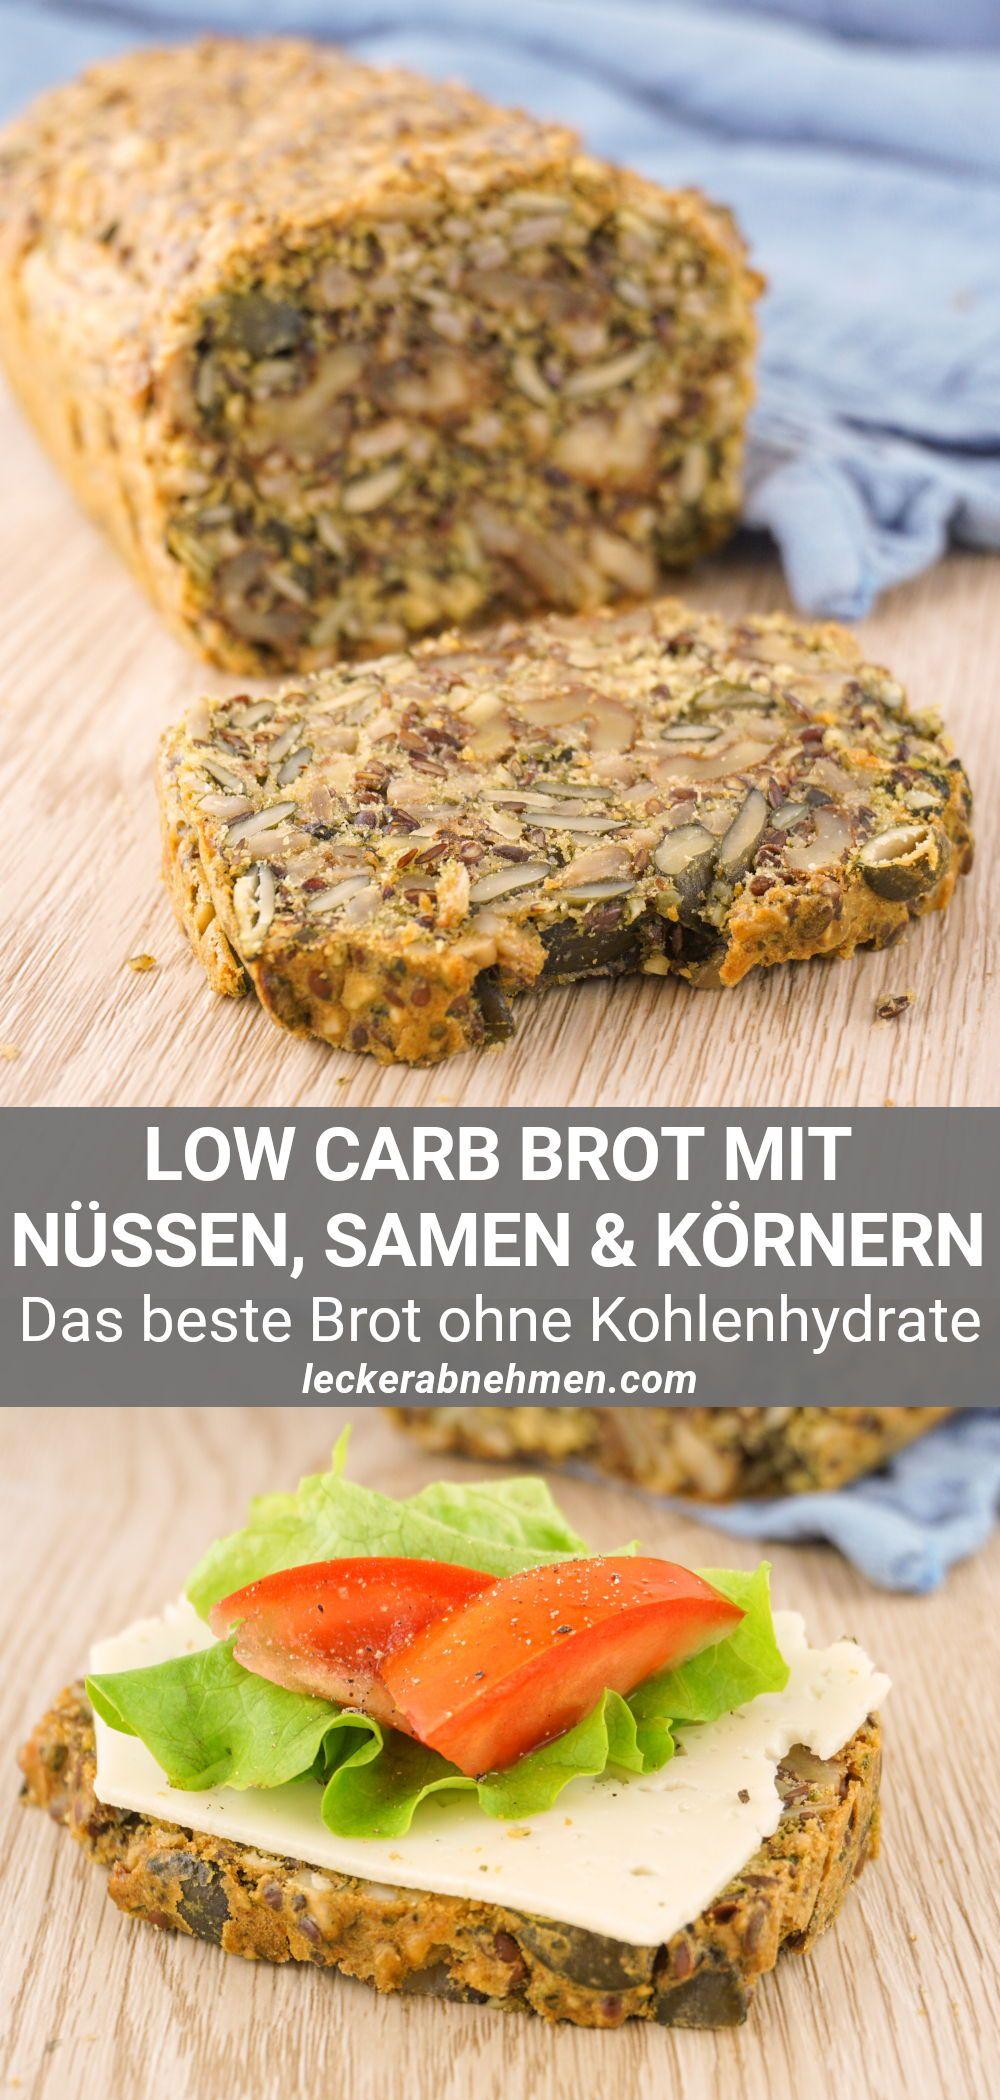 Low Carb Brot mit Nüssen – Einfaches & leckeres Rezept